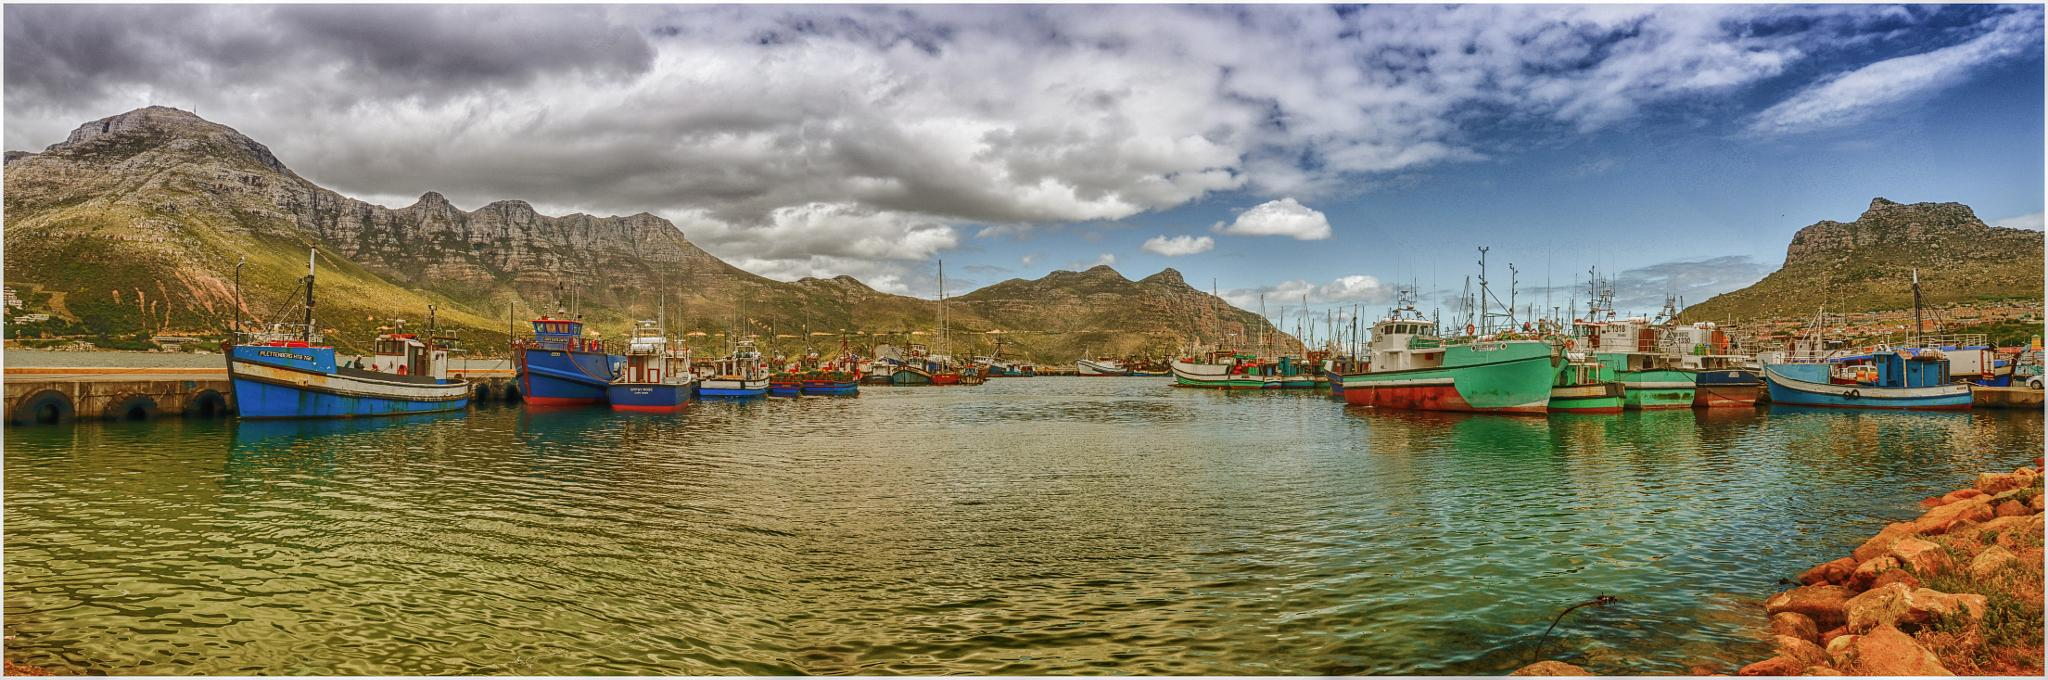 Hout Bay Harbour by alexiusvanderwesthuizen